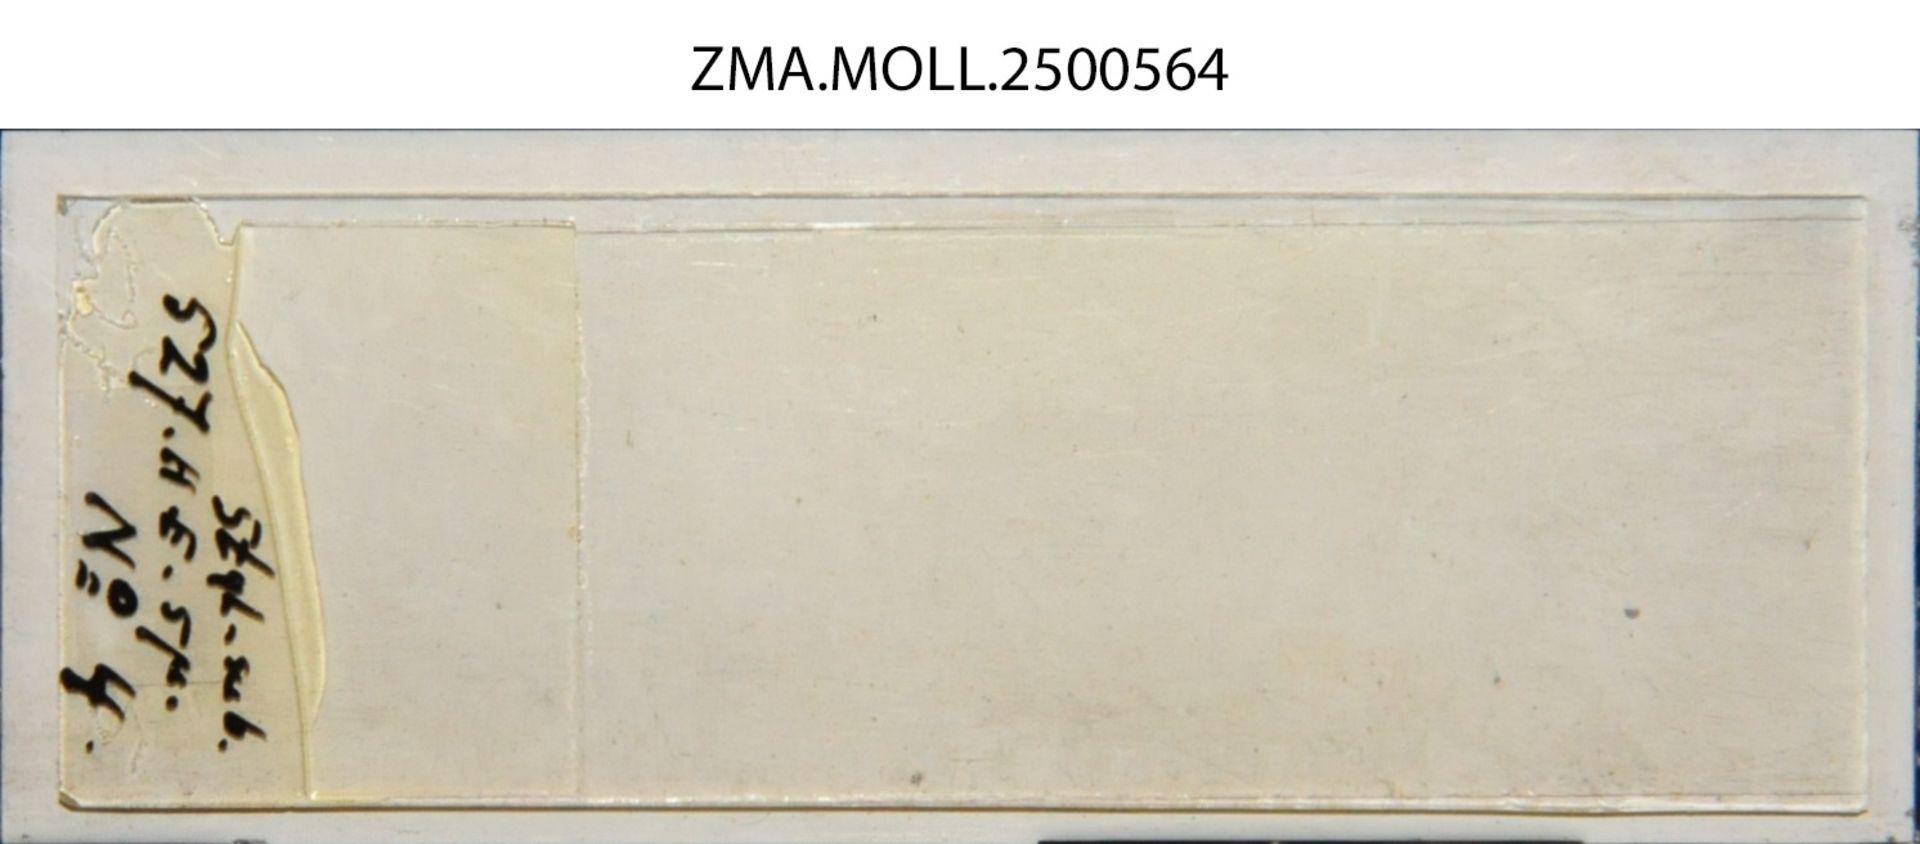 ZMA.MOLL.2500564 | Styliola subula (Quoy & Gaimard, 1827)